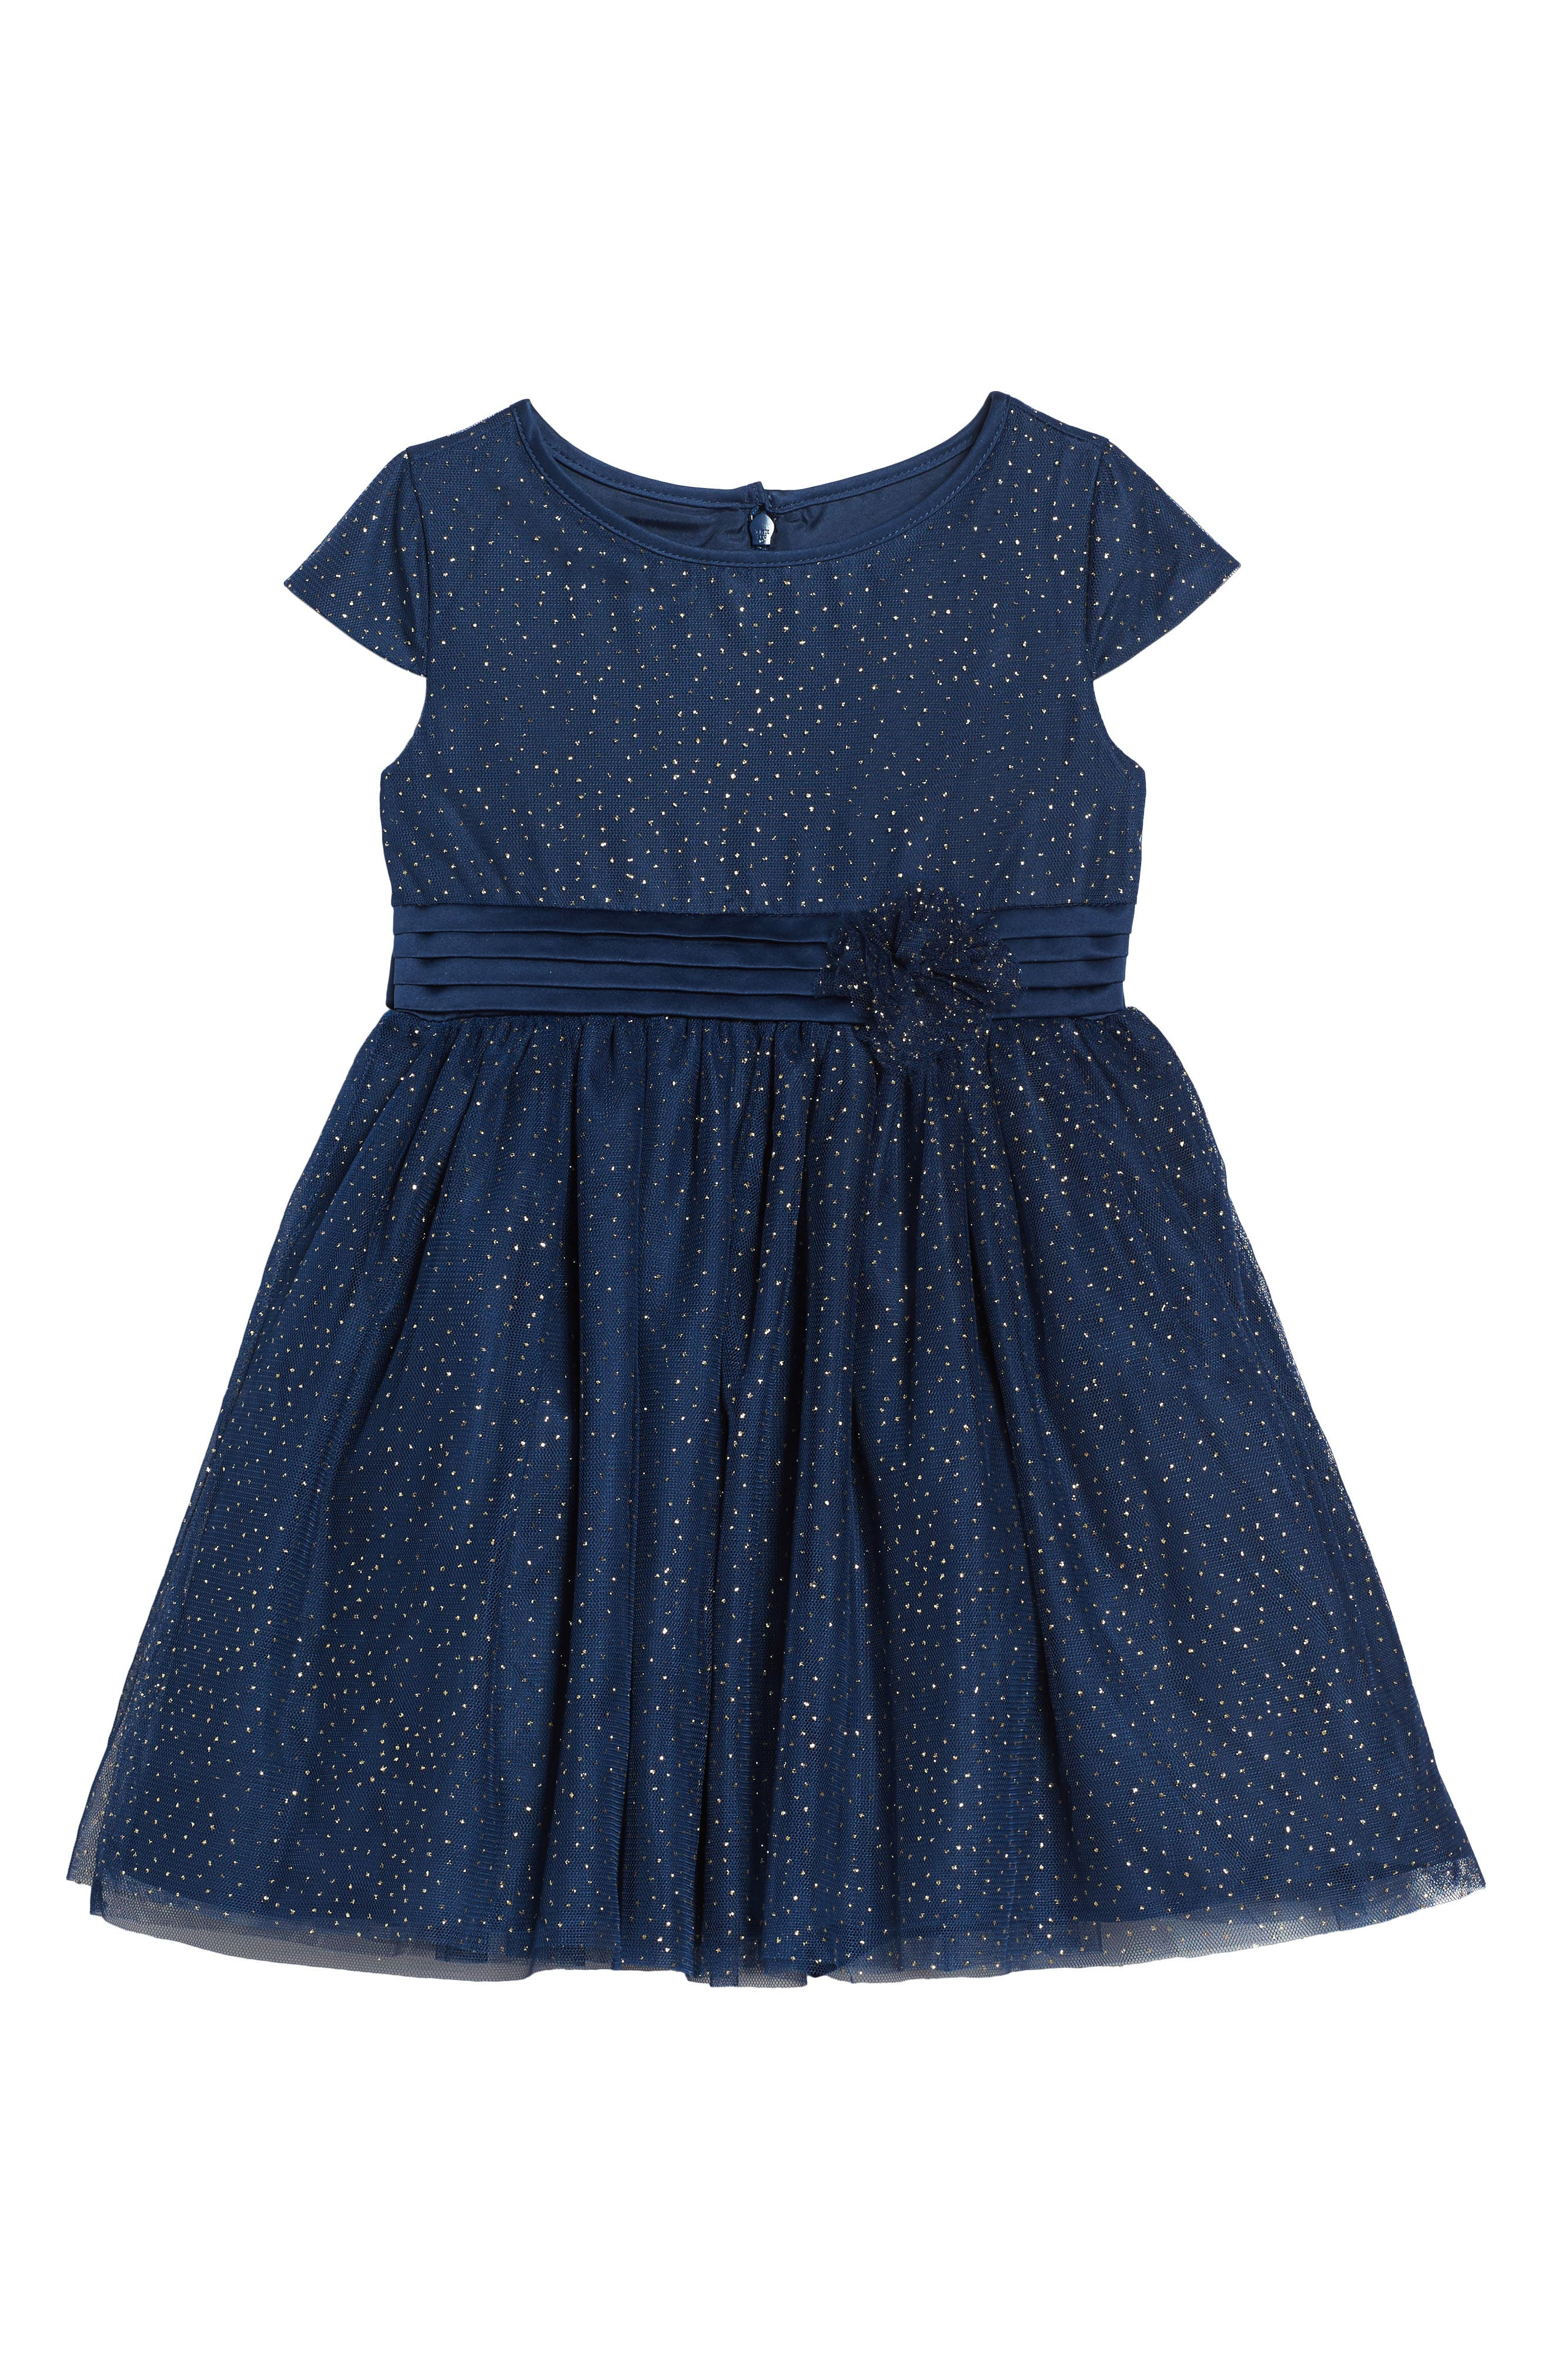 Illusion Mesh Party Dress,                         Main,                         color, 406